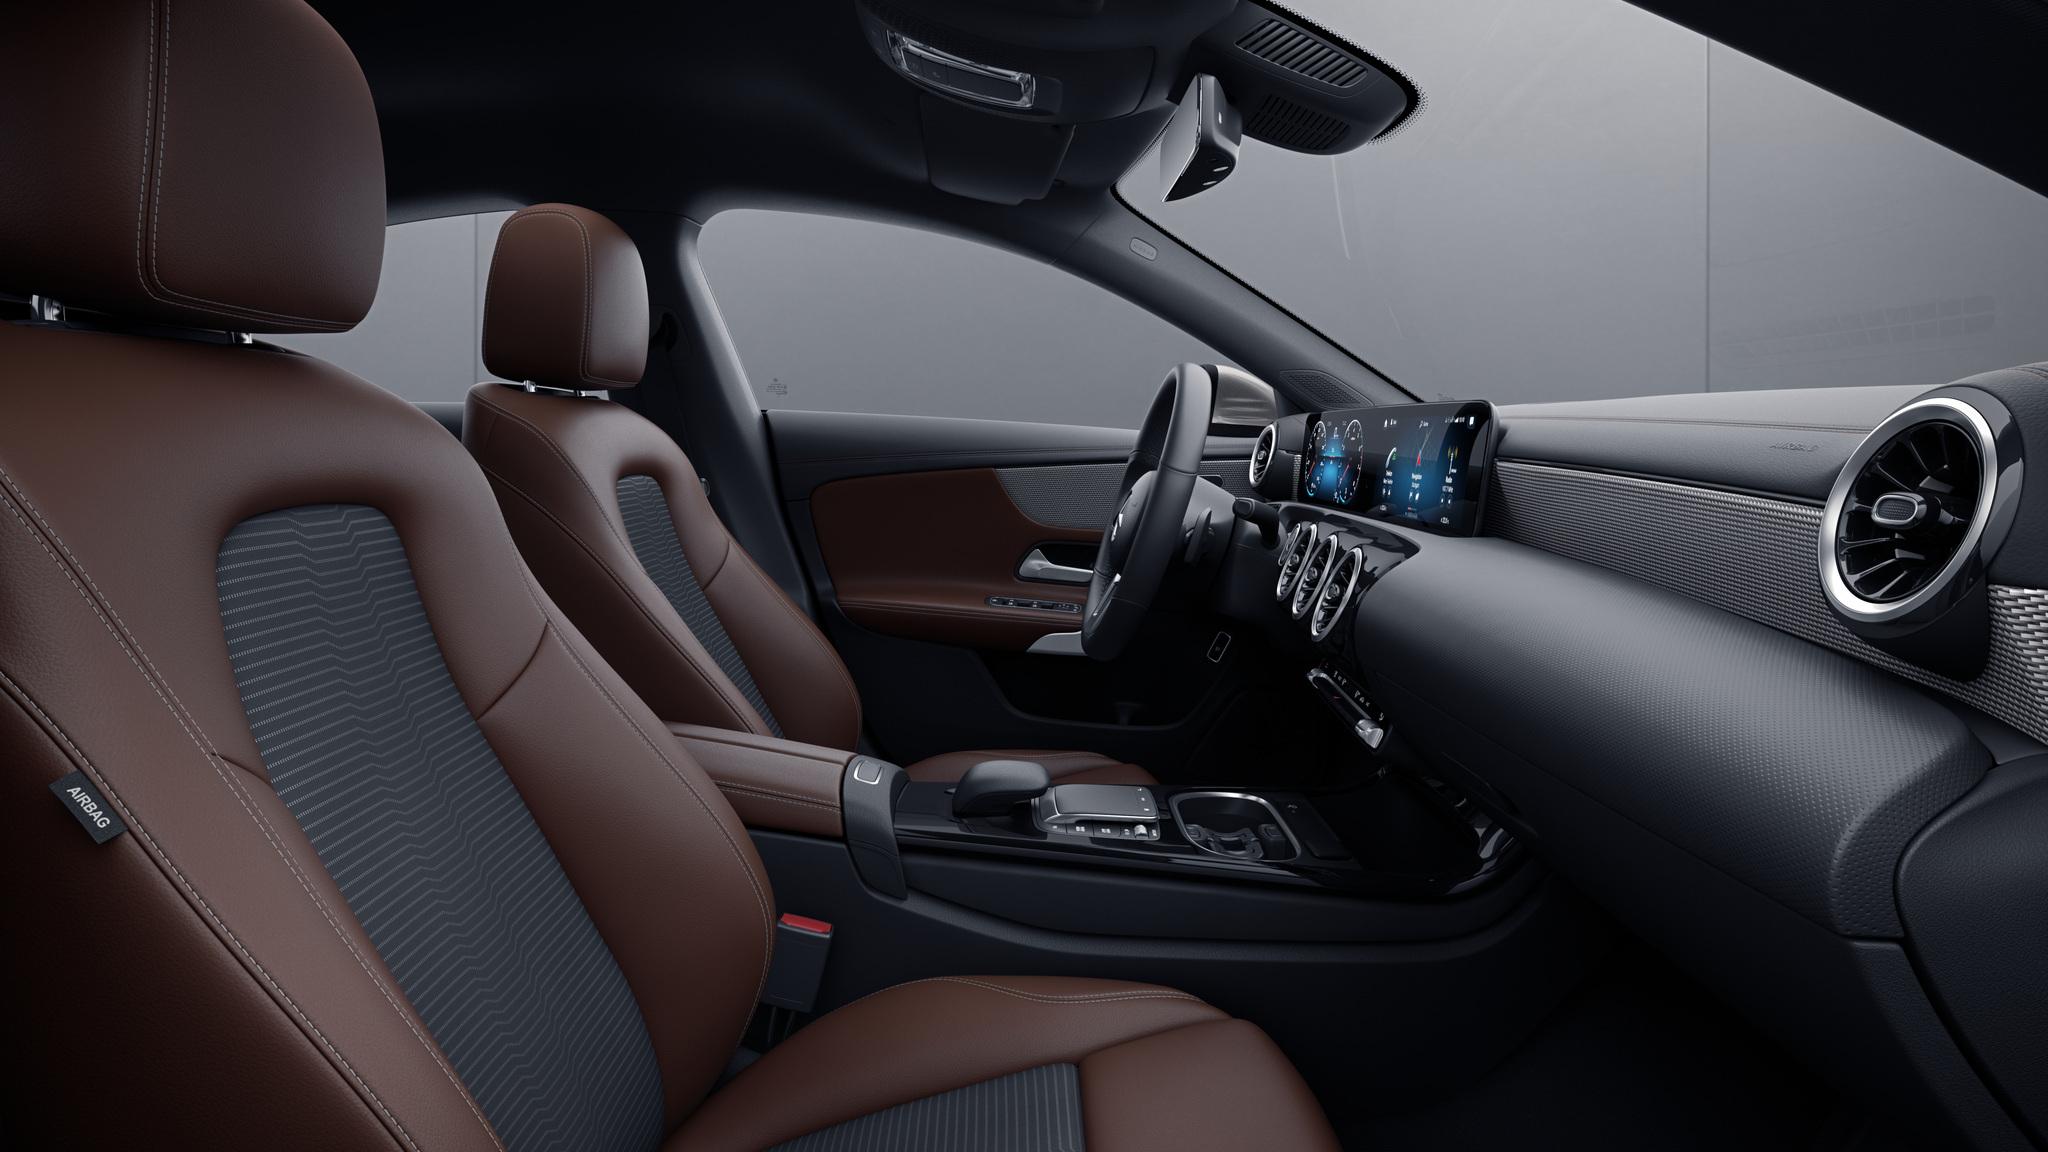 Habitacle de la Mercedes CLA avec une sellerie Similicuir ARTICO  tissu Fléron bicolore - noir marron bahia